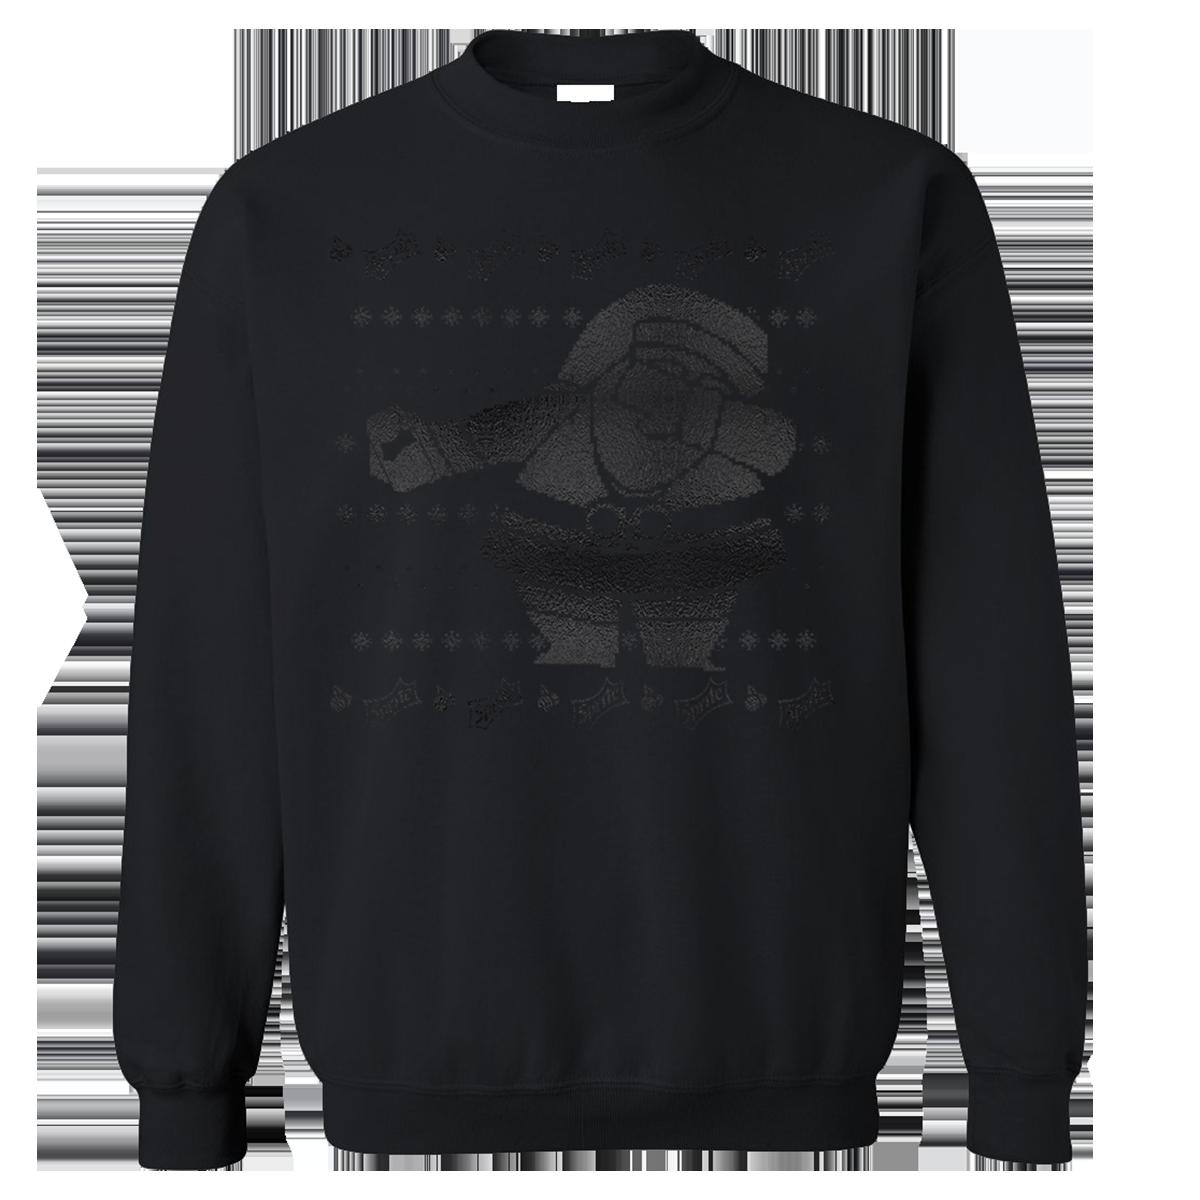 Sprite Cran x Dabbin Santa Black/Black Sweatshirt